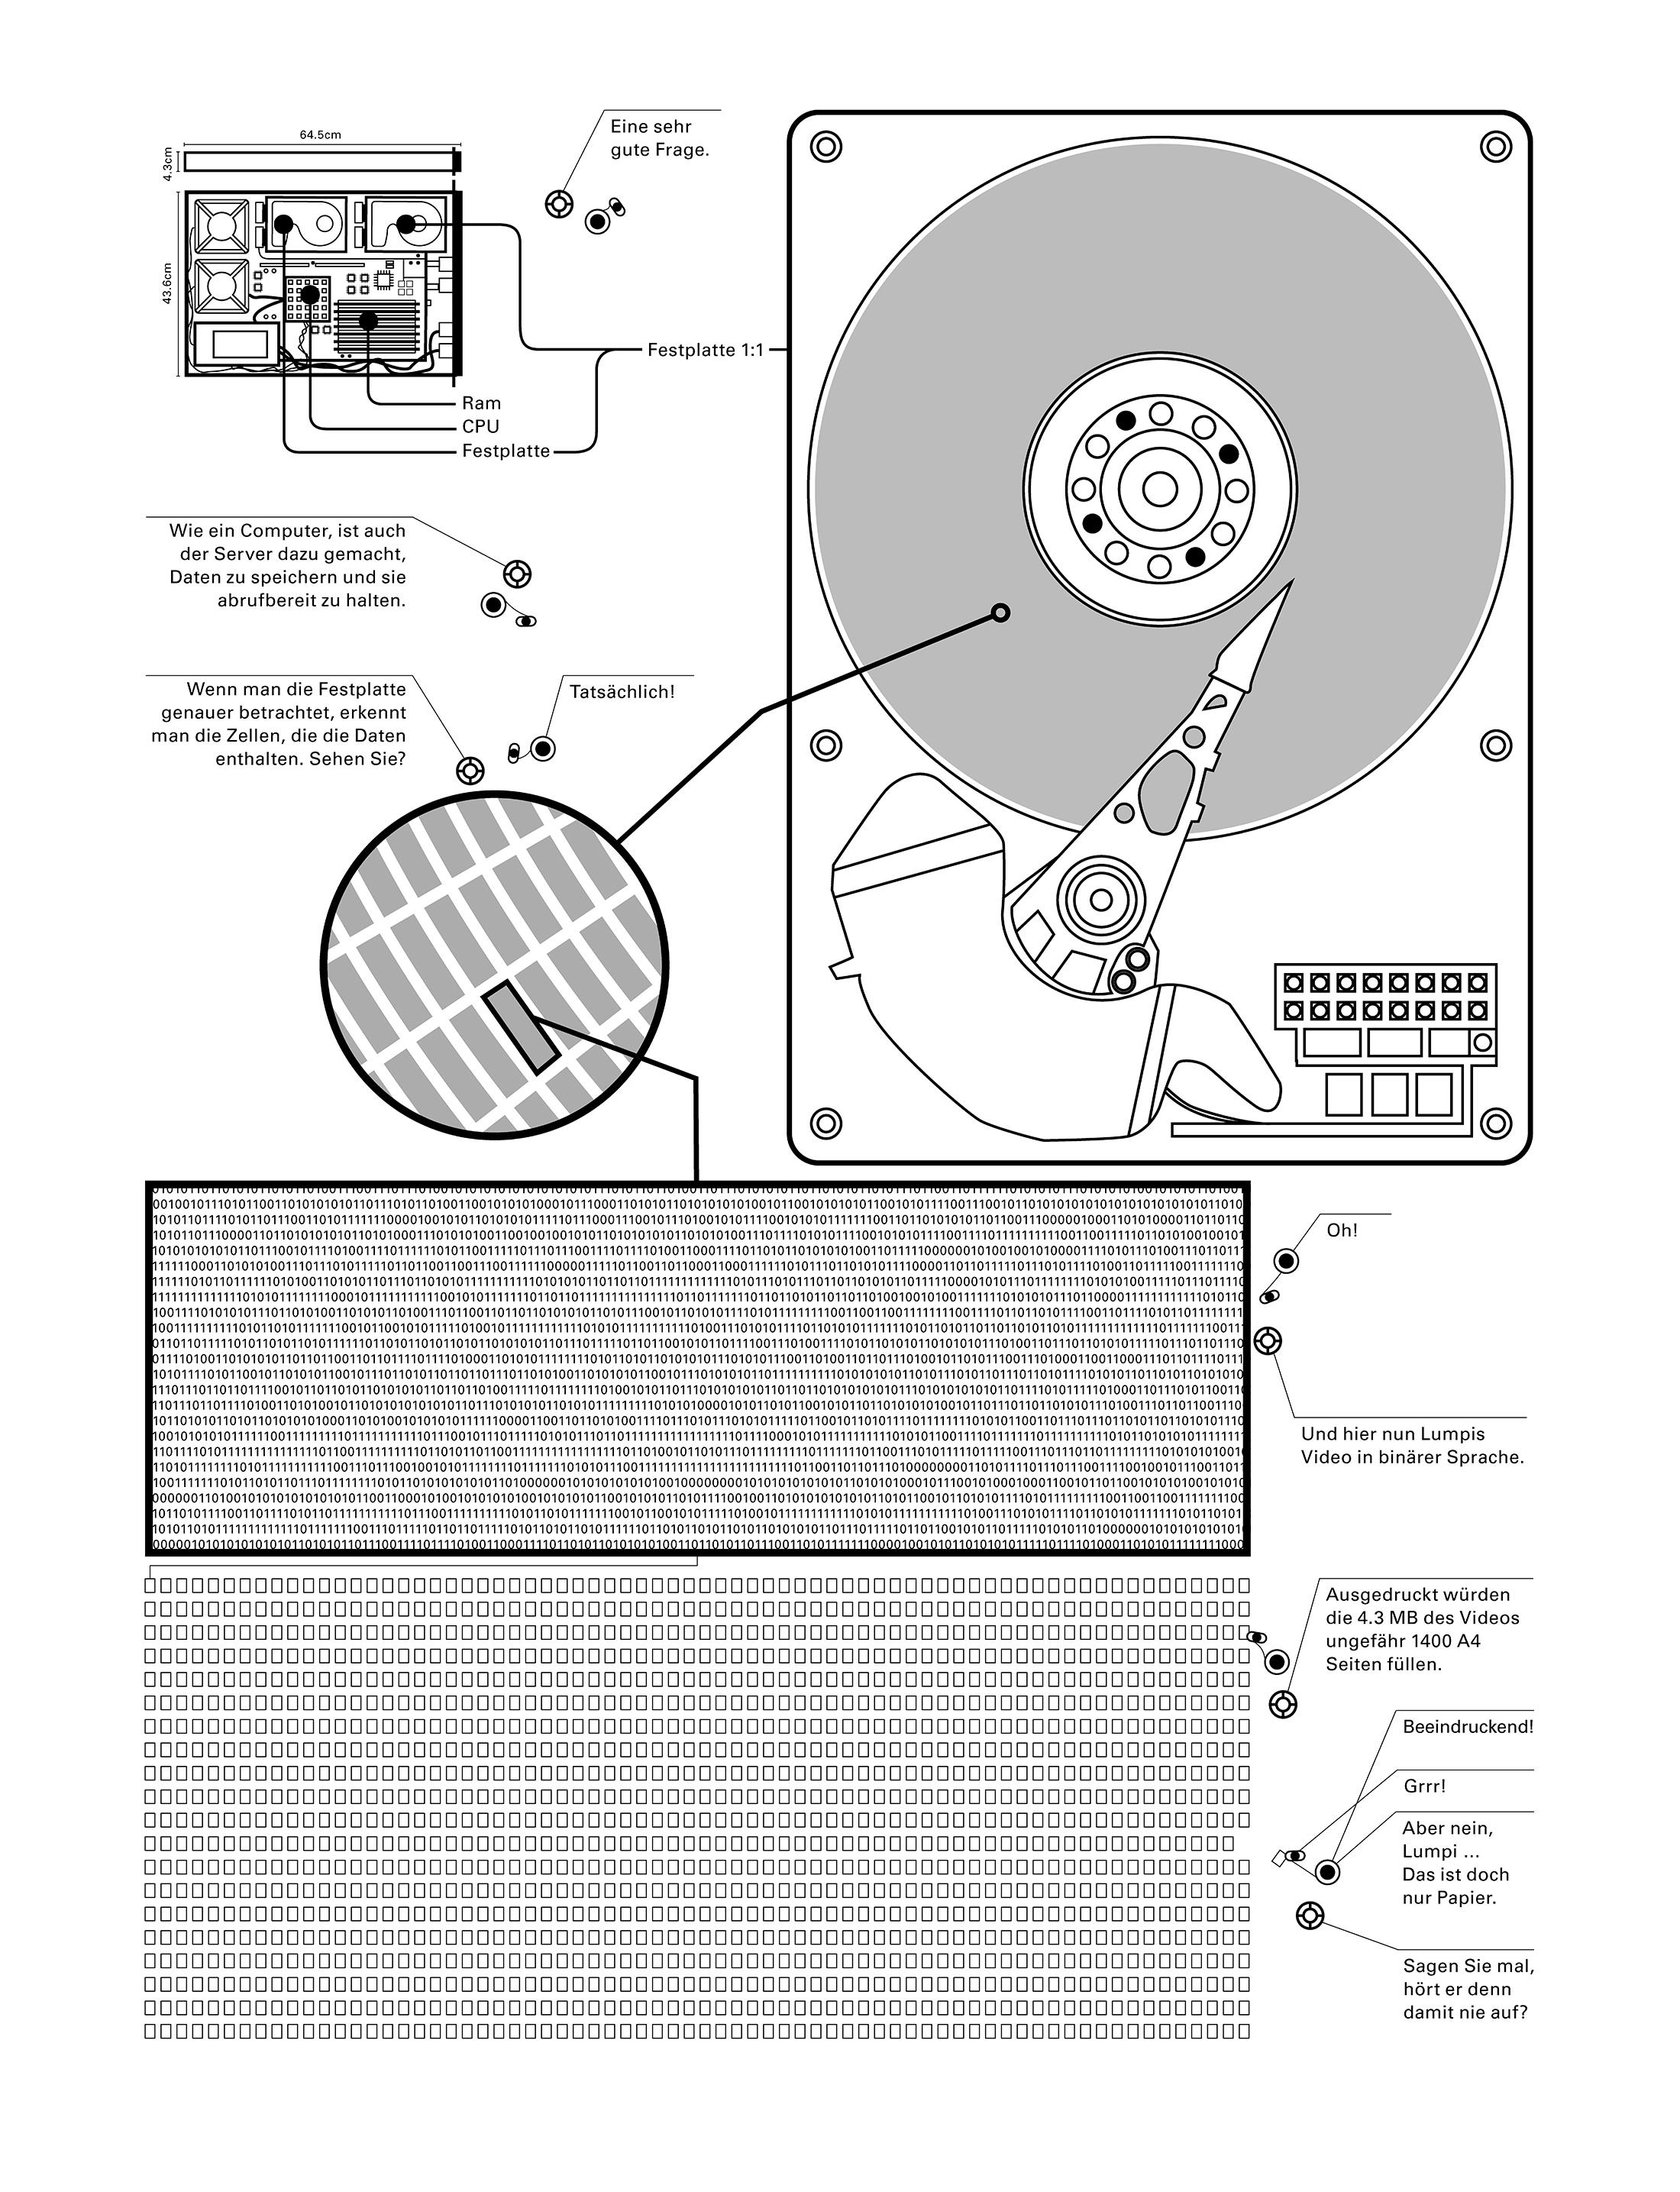 internet wo bist du denn zuhause martin panchaud. Black Bedroom Furniture Sets. Home Design Ideas